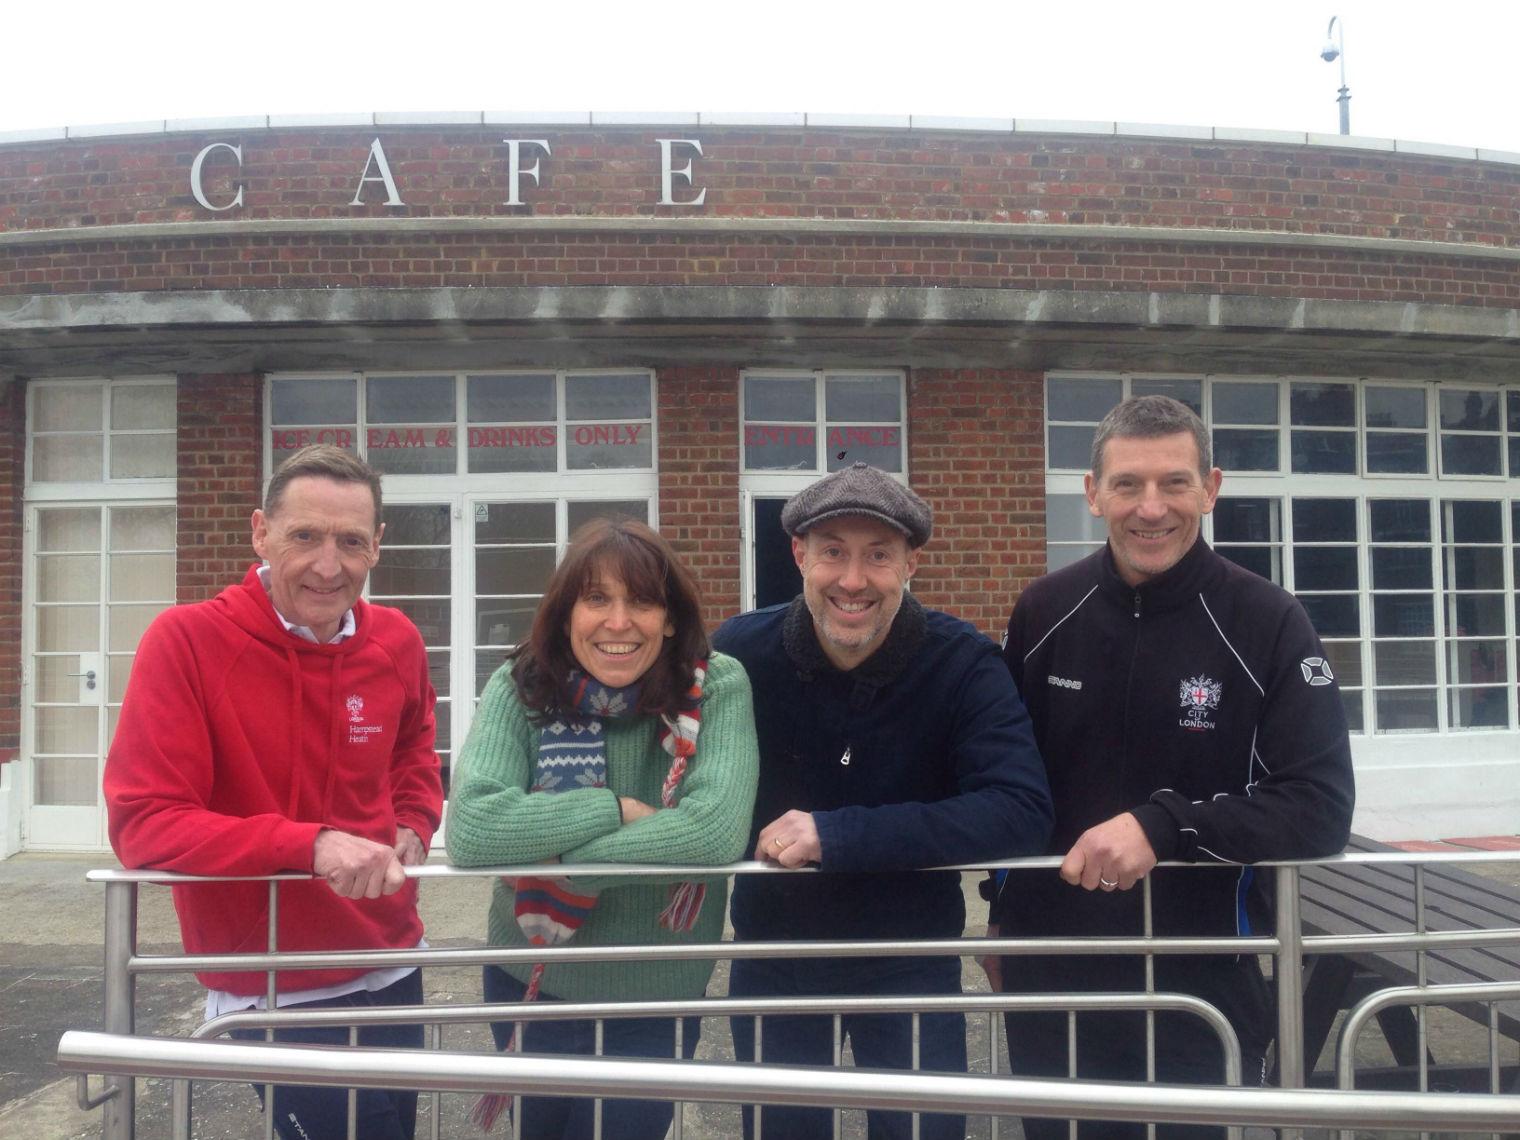 Tara Kingsley, her husband Paul (second right) and friends outside the Lide Cafe. Photo:Gavin Fernback